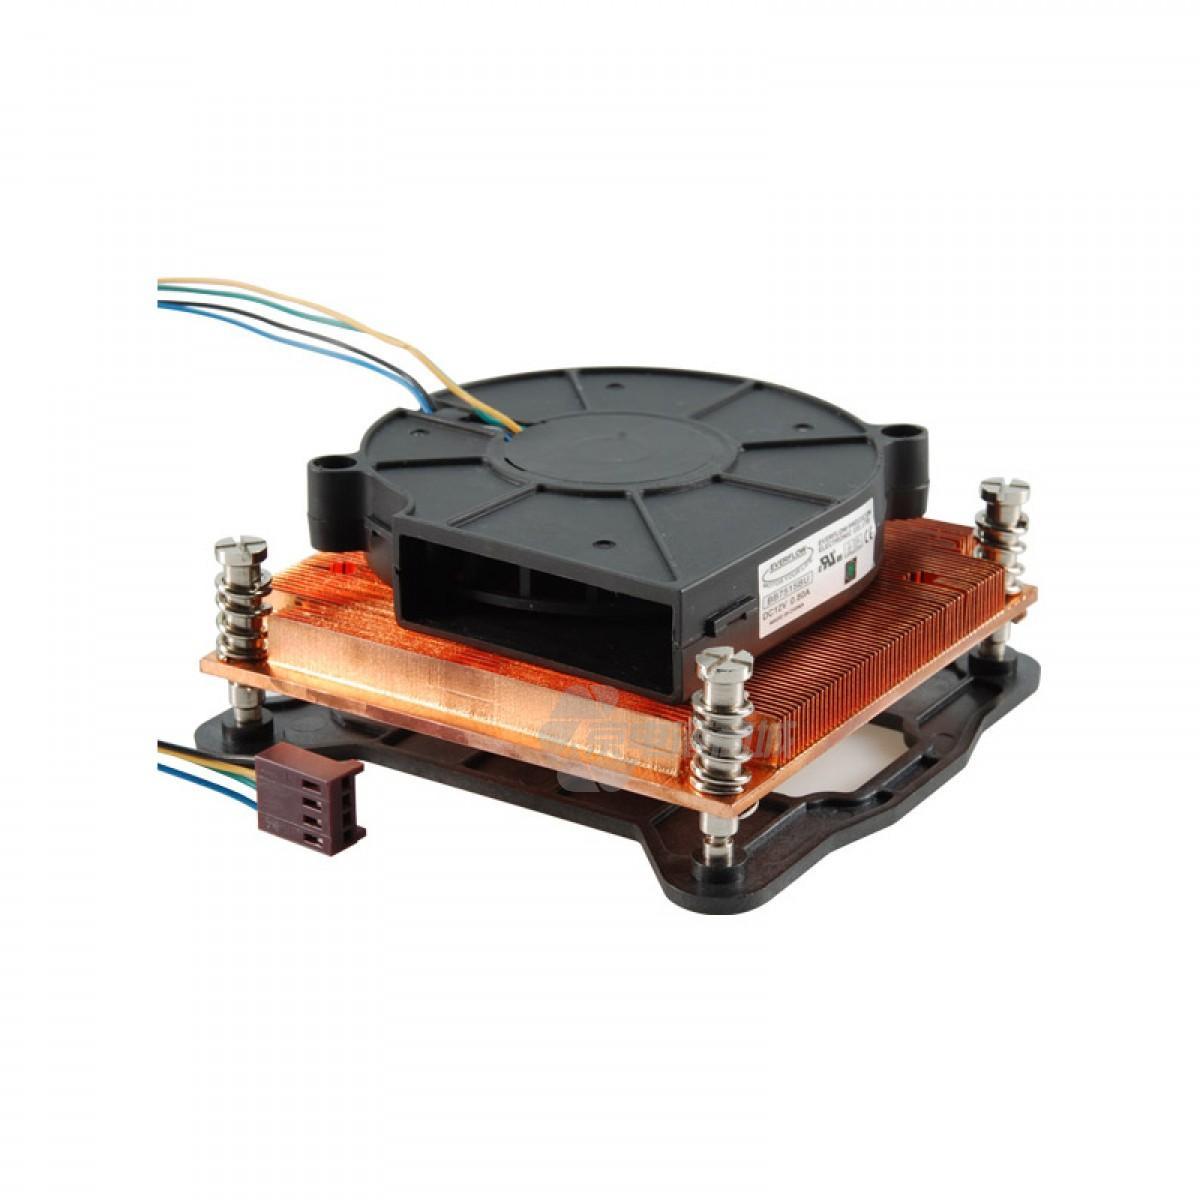 EVERCOOL LGAL1156A B715 84x84x 27.7mm SERVER COOLER